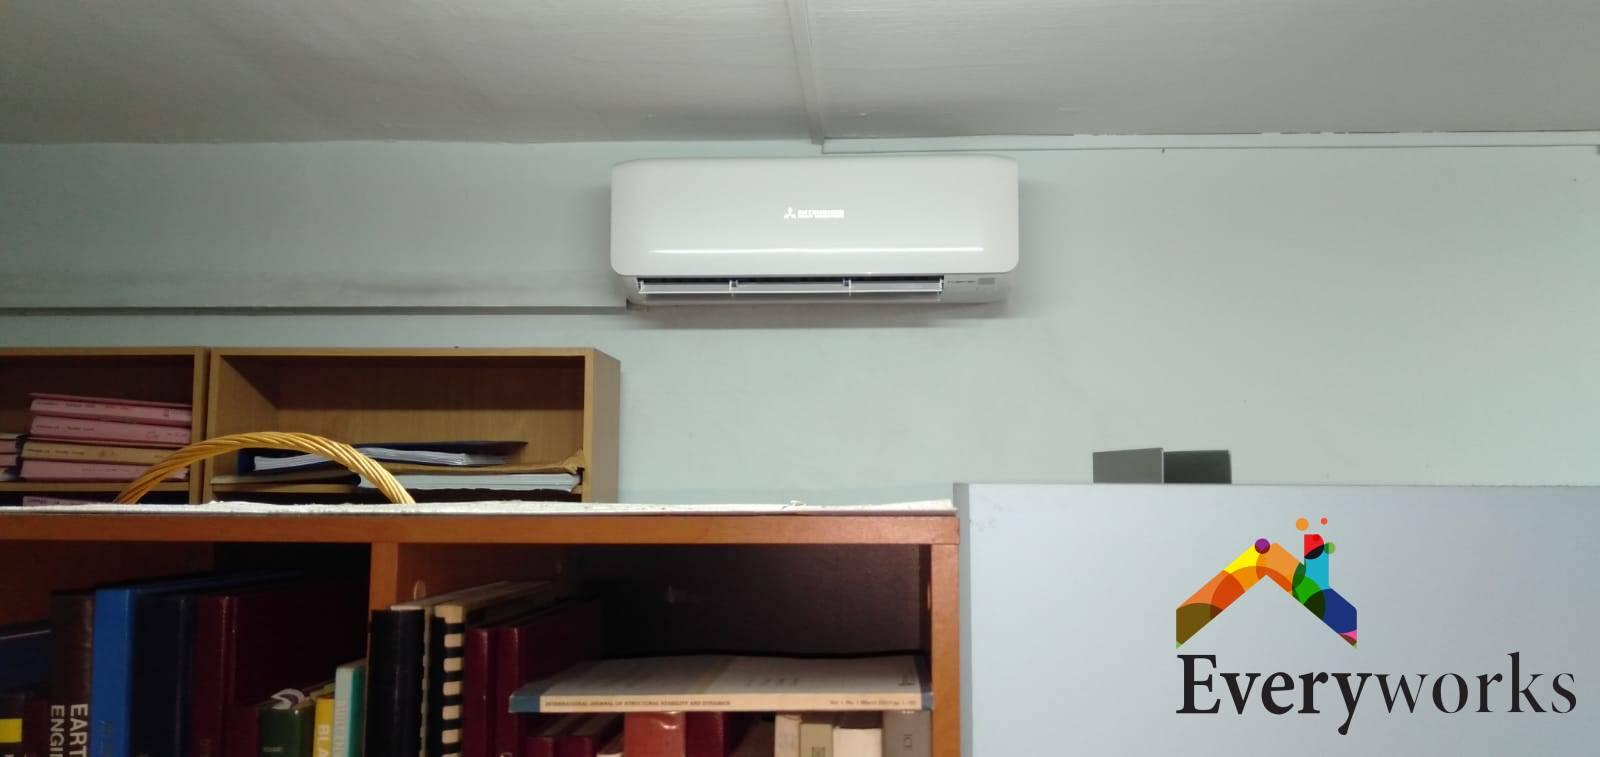 Aircon Replacement Aircon Installation Aircon Servicing Singapore – HDB Sengkang